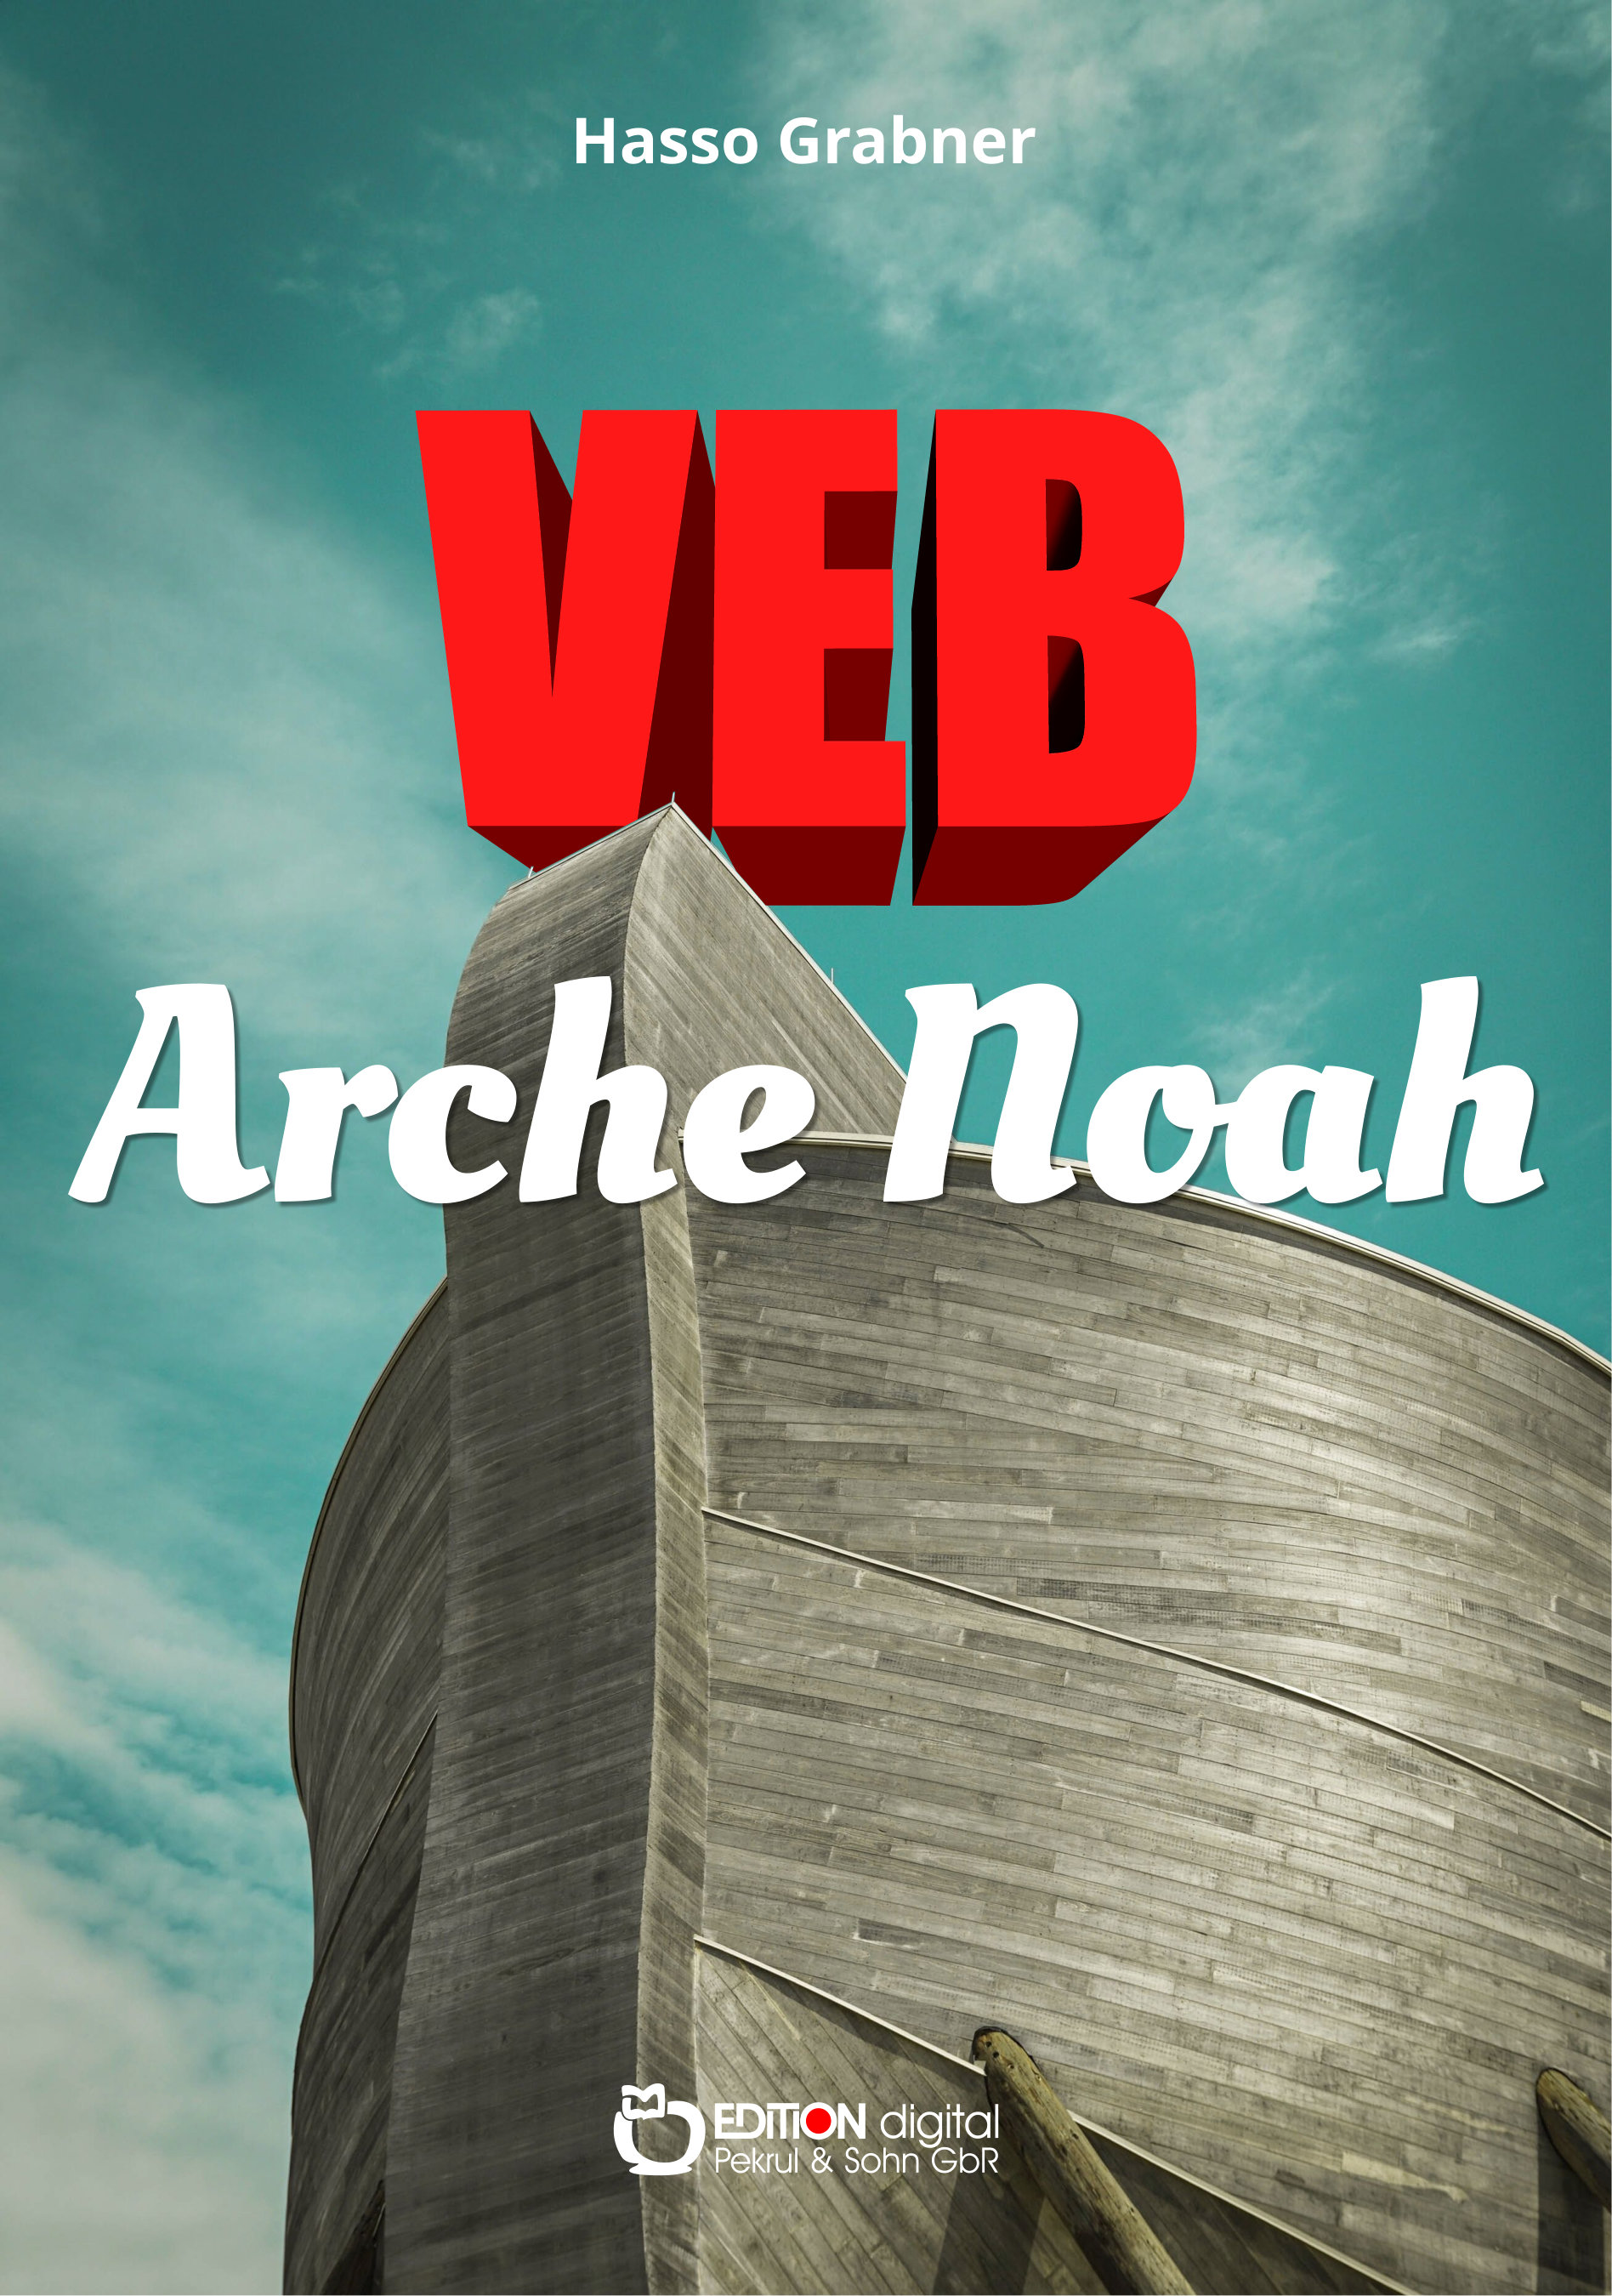 VEB Arche Noah. Roman von Hasso Grabner